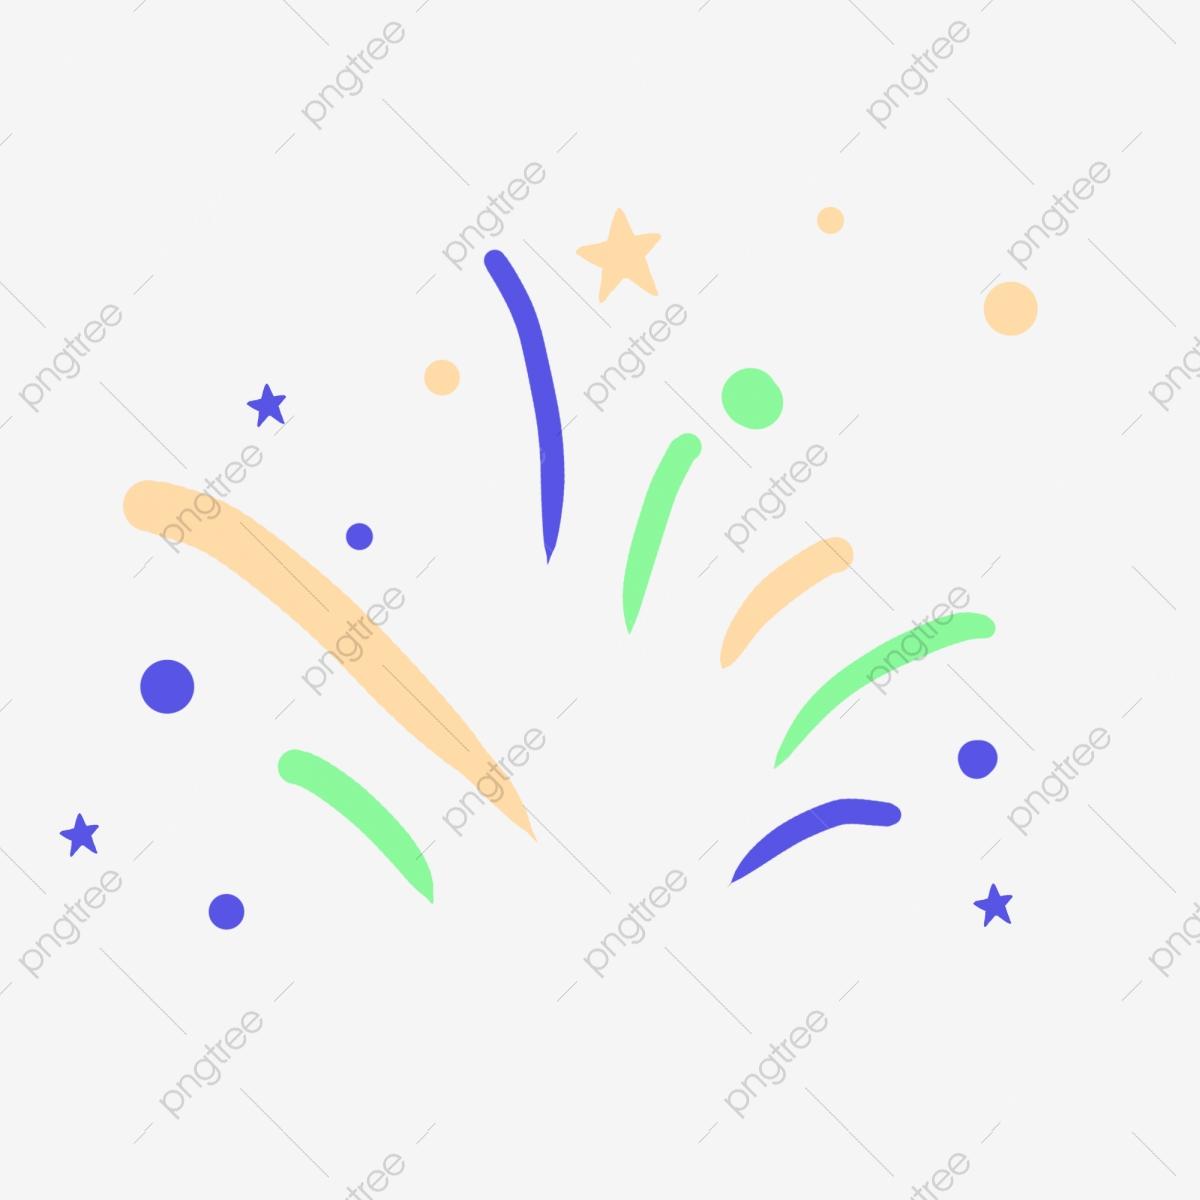 Streamers clipart festival decoration. Color celebration streamer cartoon